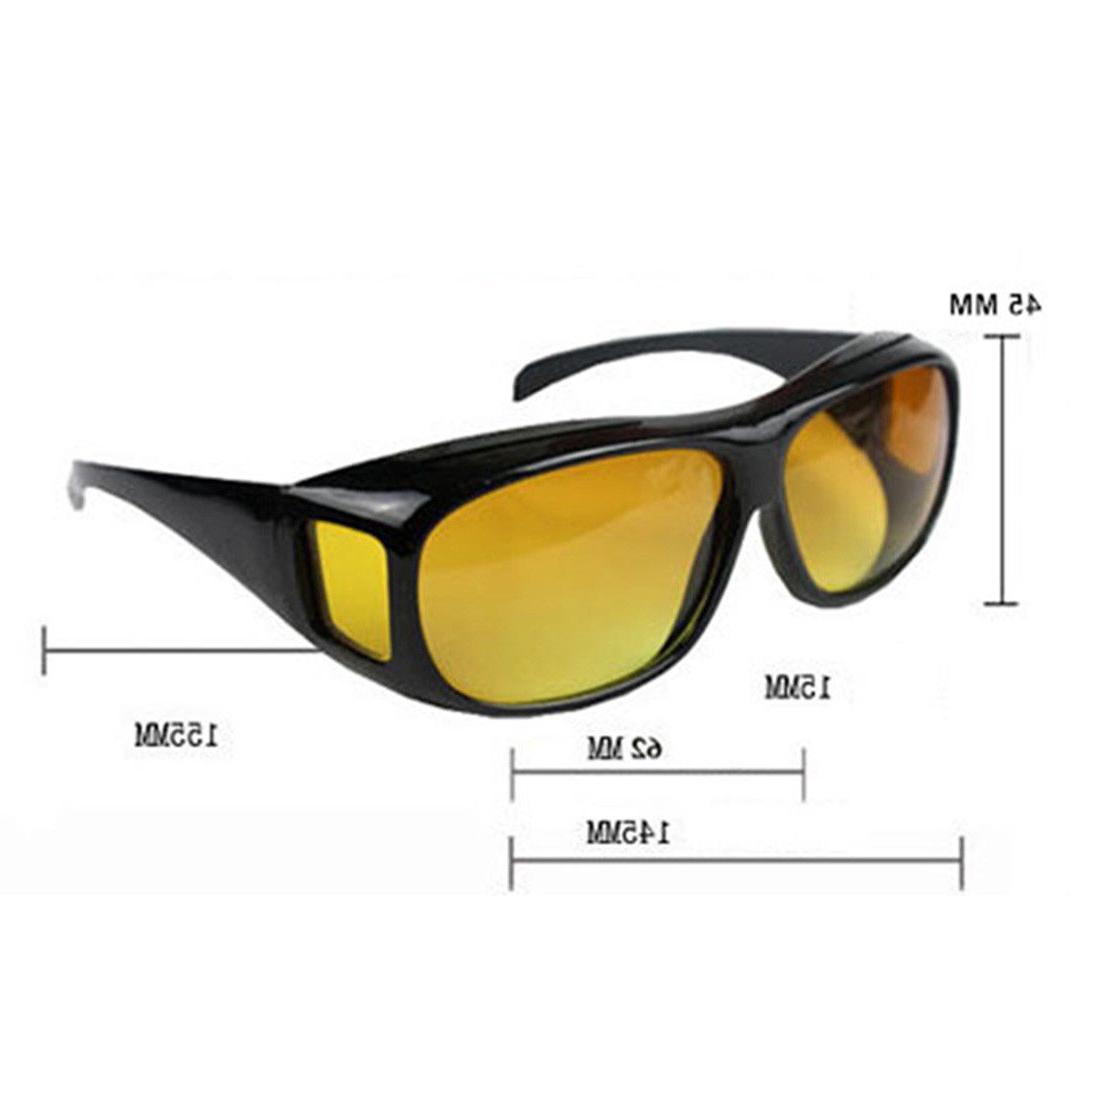 2 Pair HD Night Sunglasses Fits As